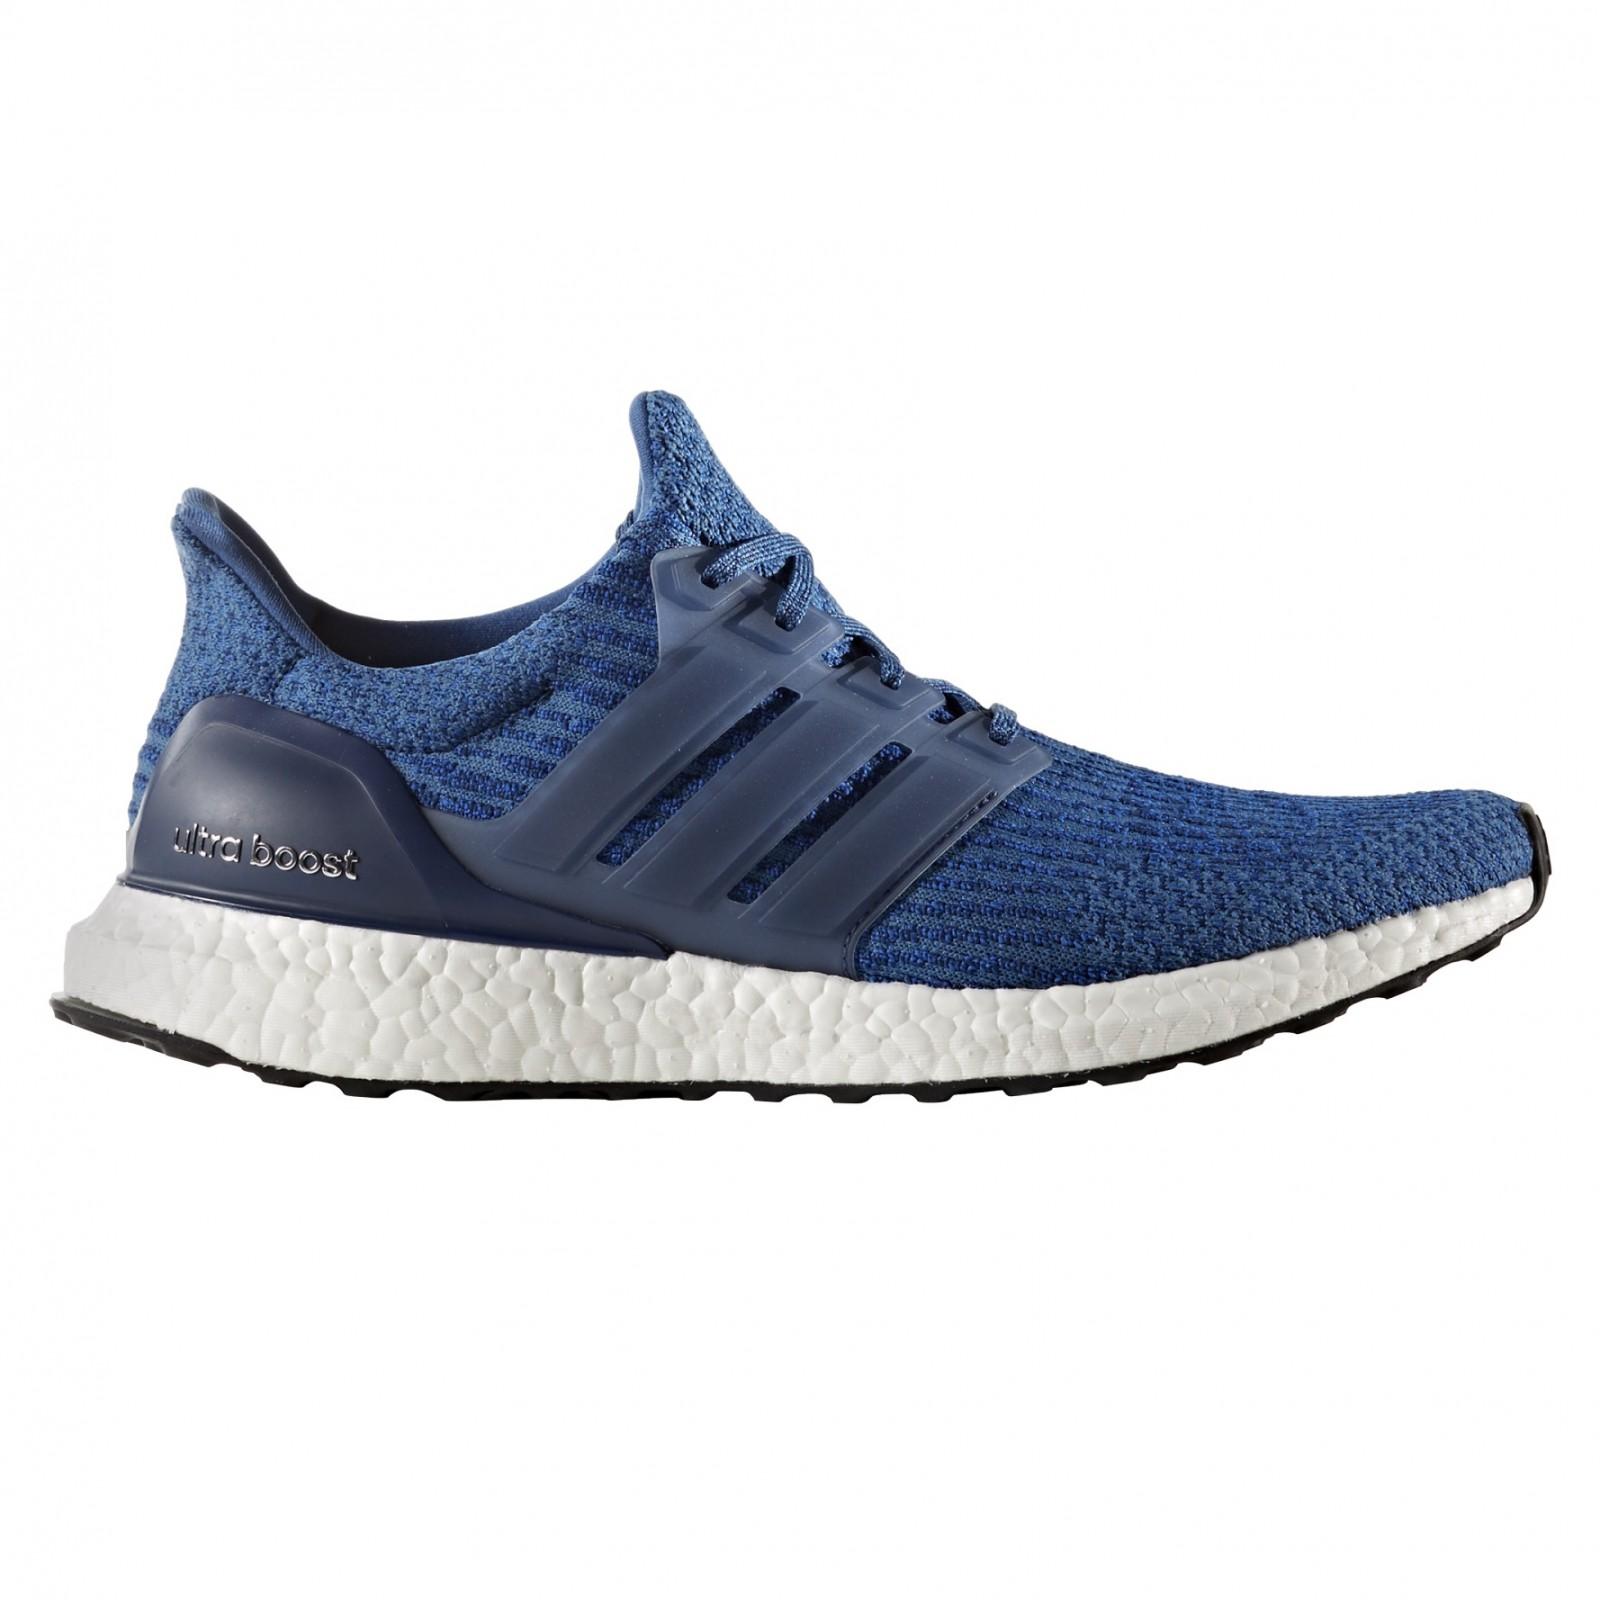 Pánské běžecké boty adidas UltraBOOST  ecbb041a835